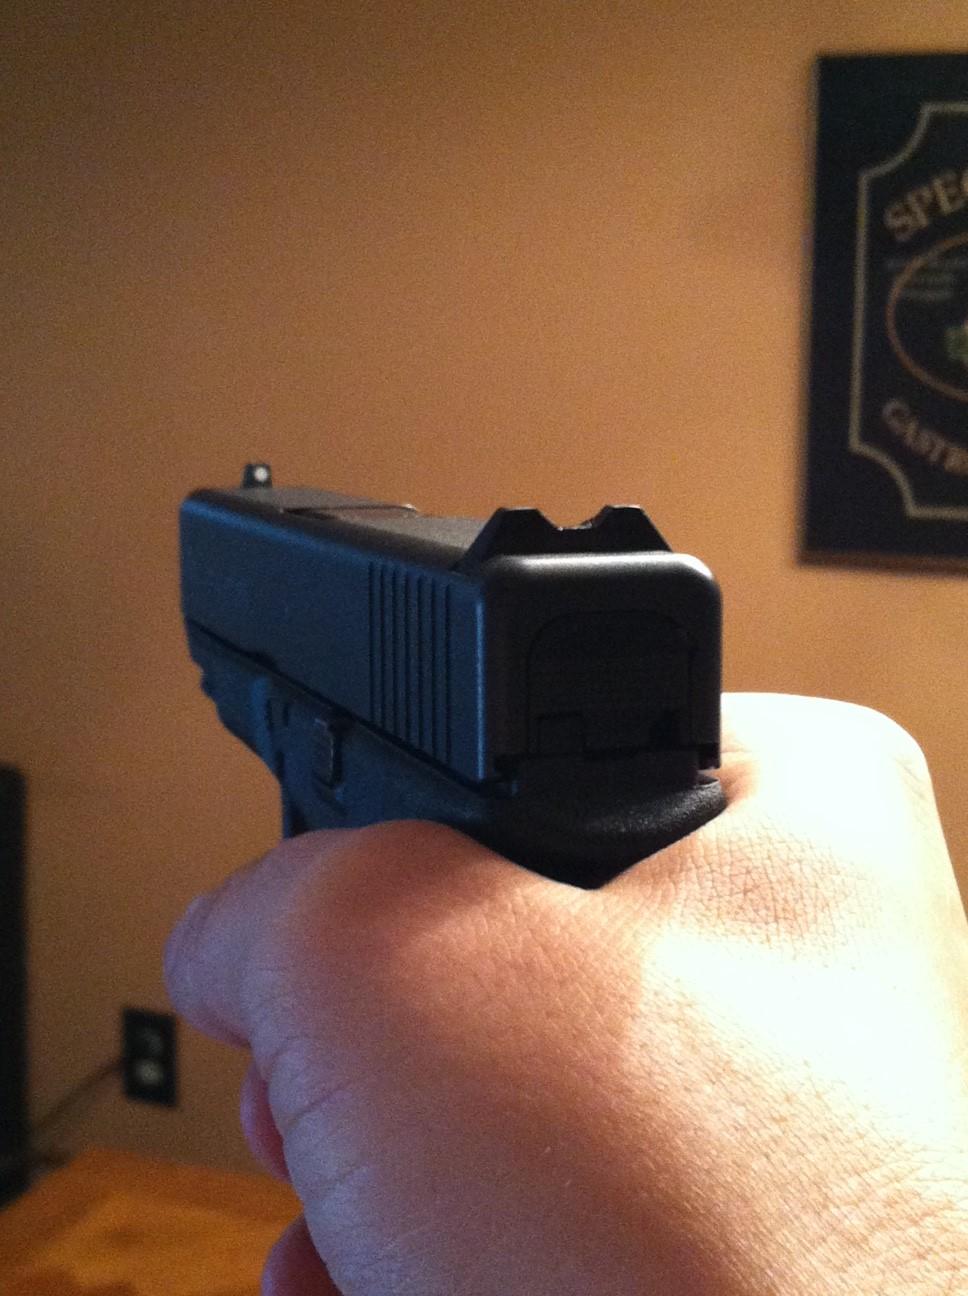 My home made Glock Sight-glocksight.jpg